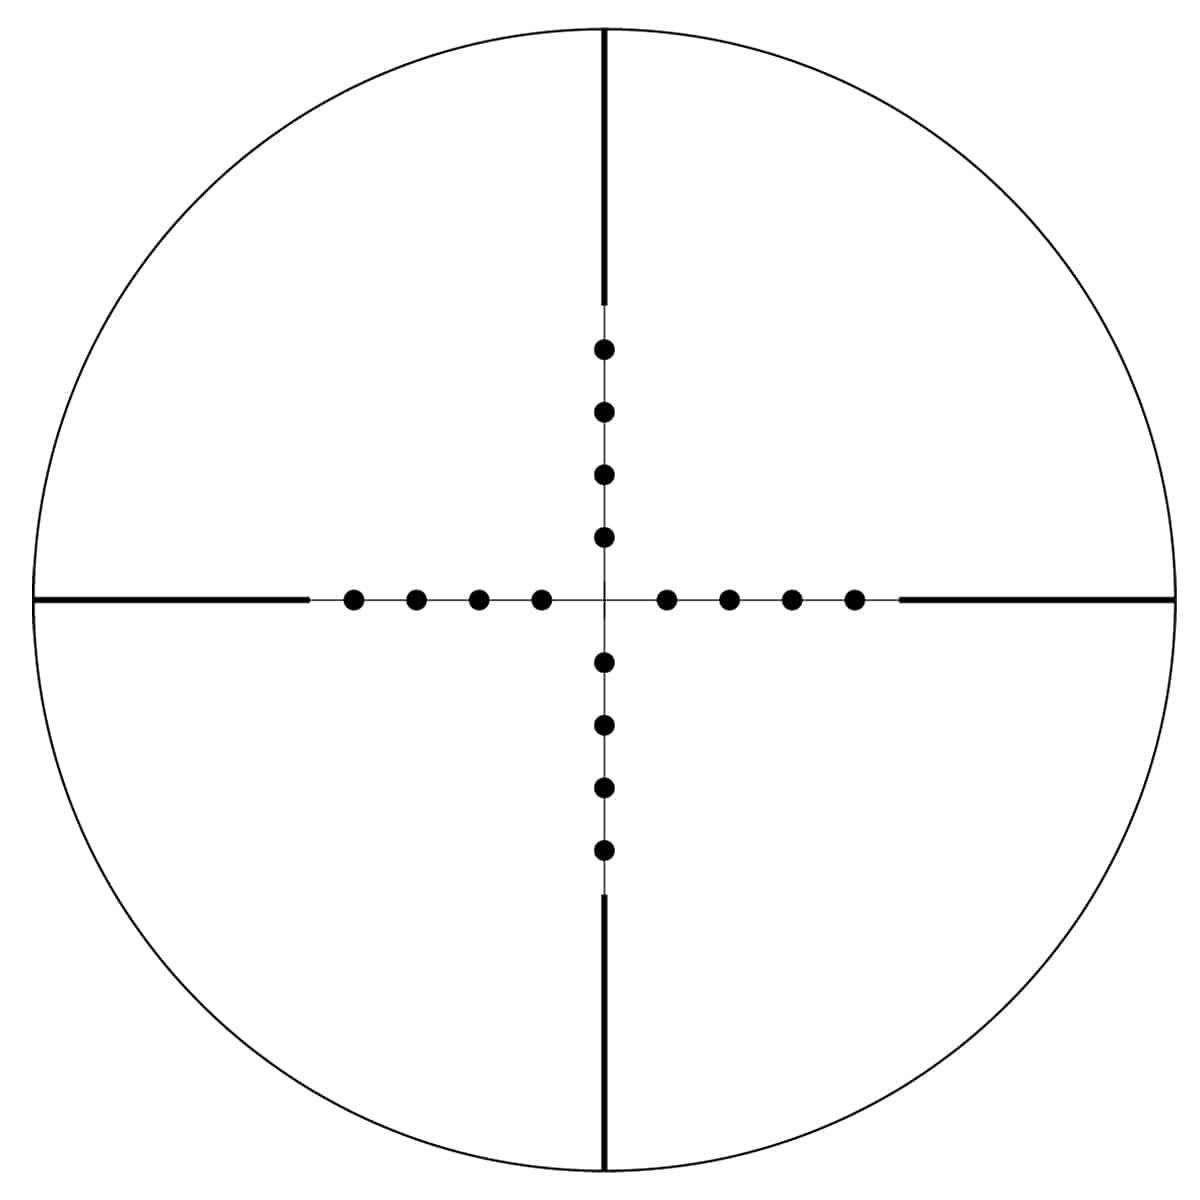 SL 1-4x24 Acom reticle